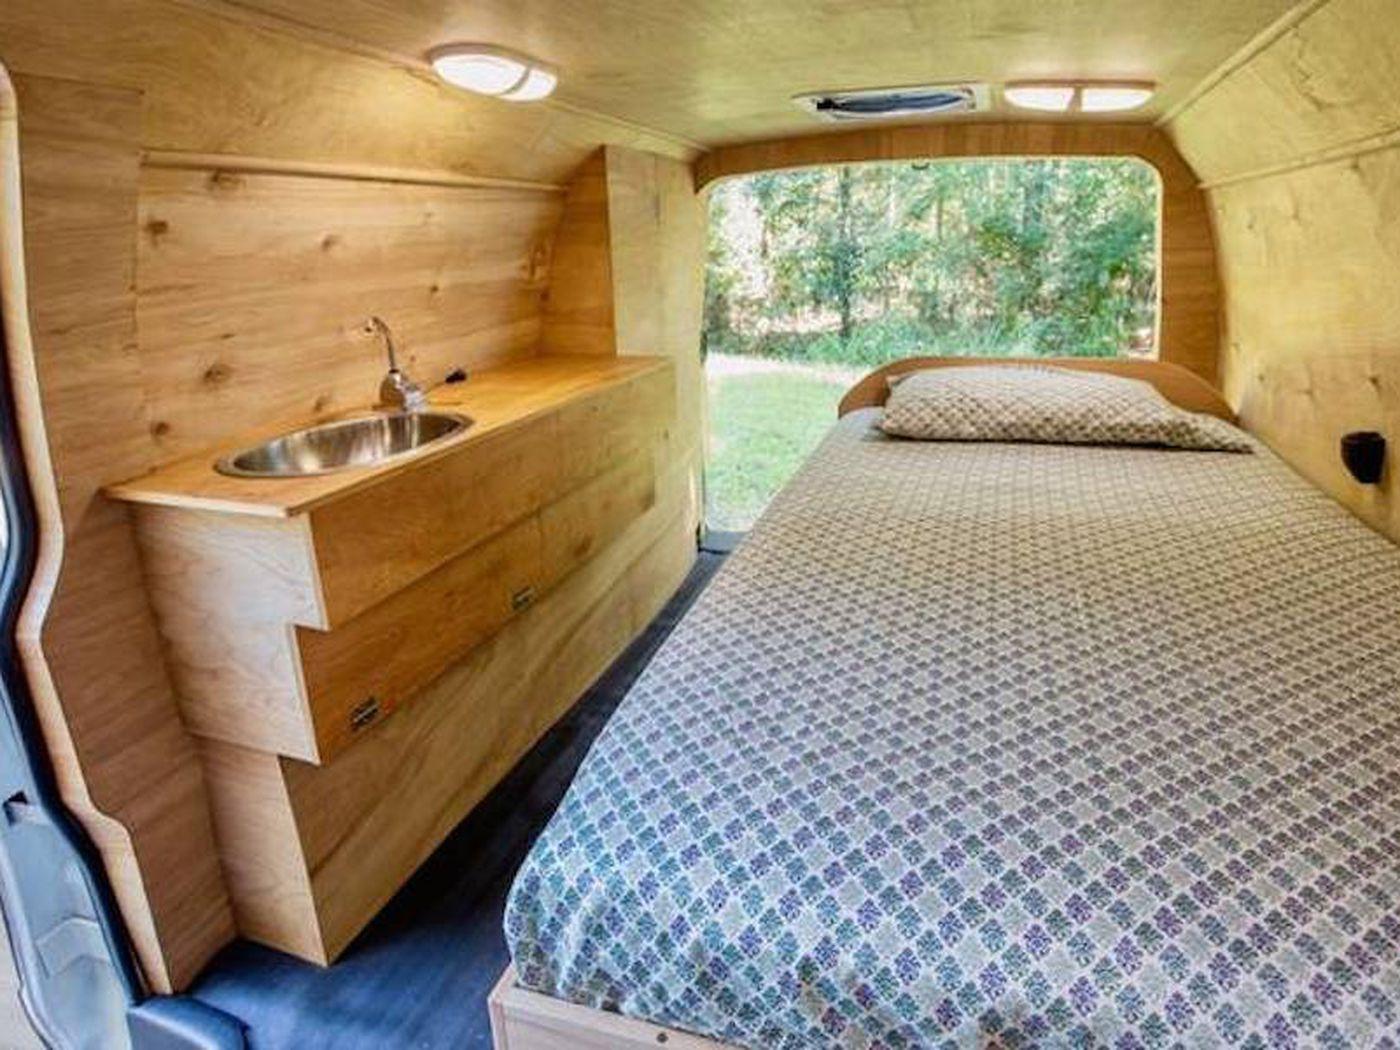 Eco Friendly Converted Van Home Is Full Of Hidden Features